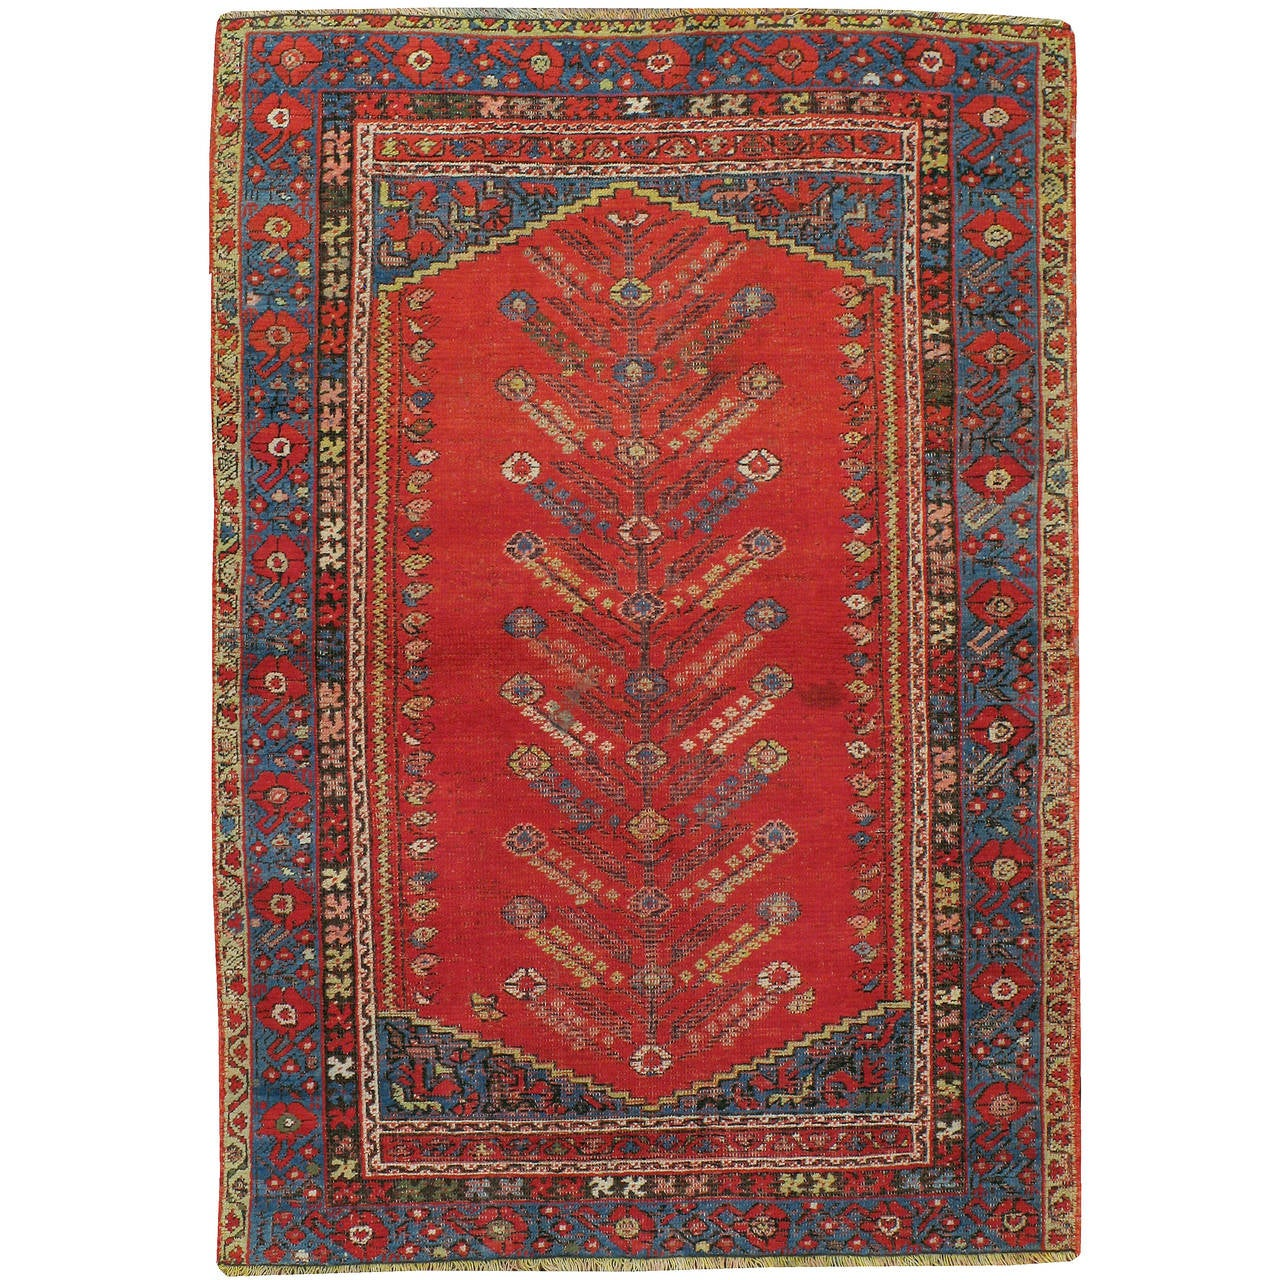 Antique Turkish Kula Rug For Sale At 1stdibs